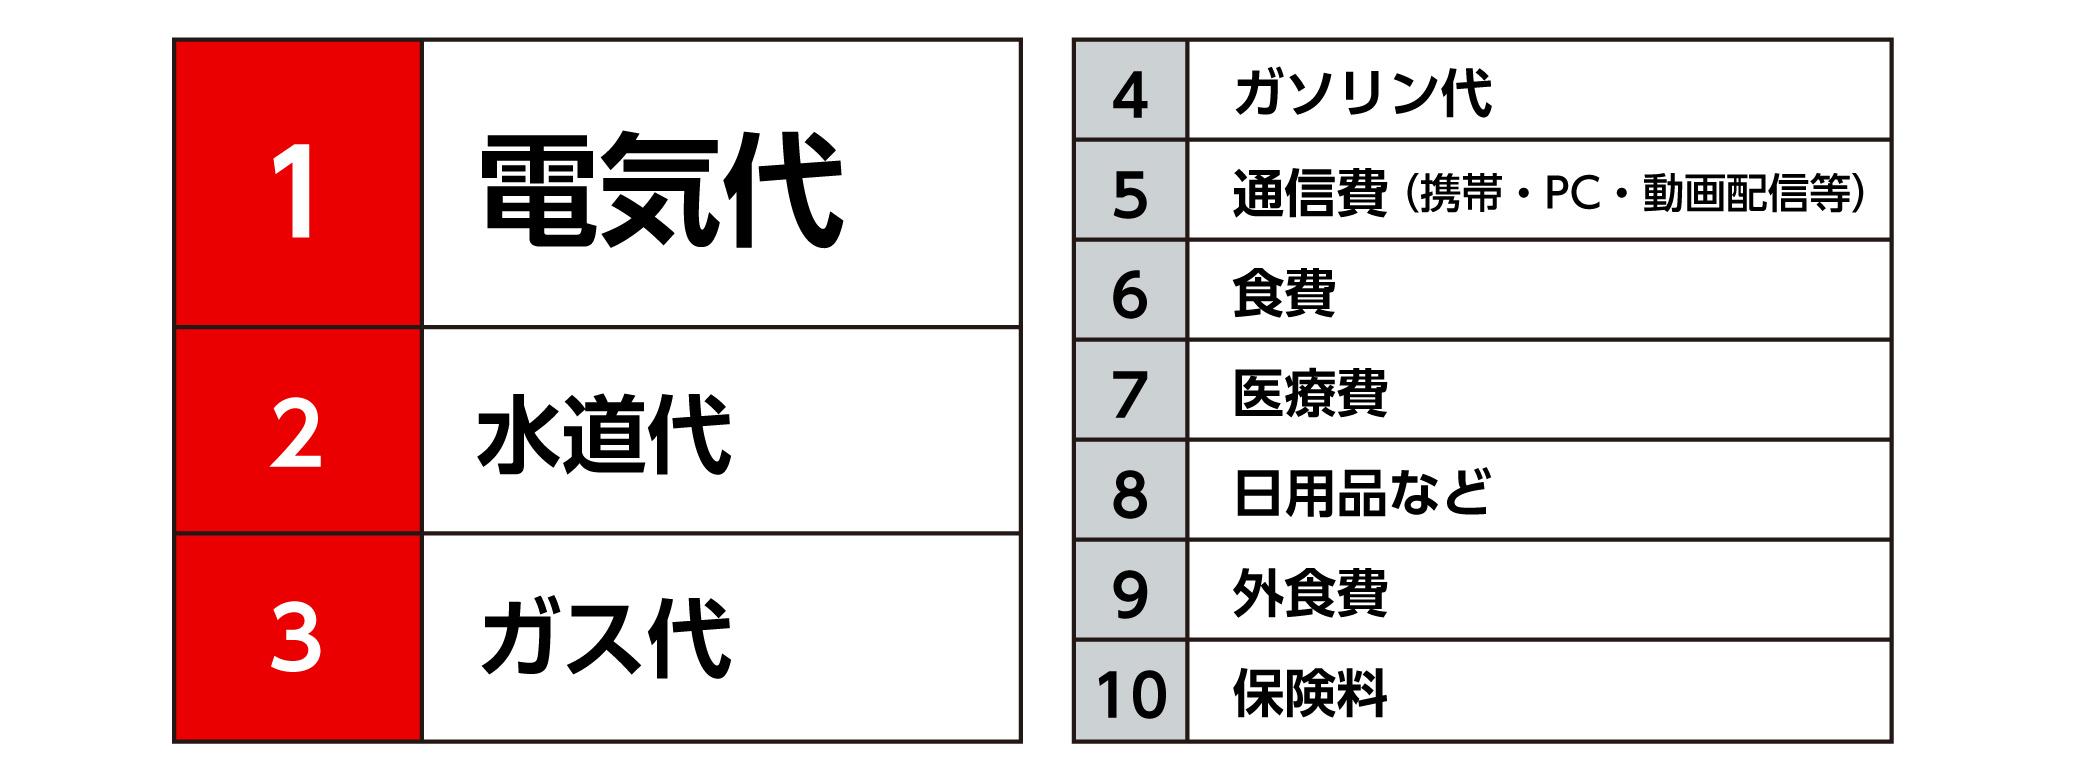 reduction_ranking